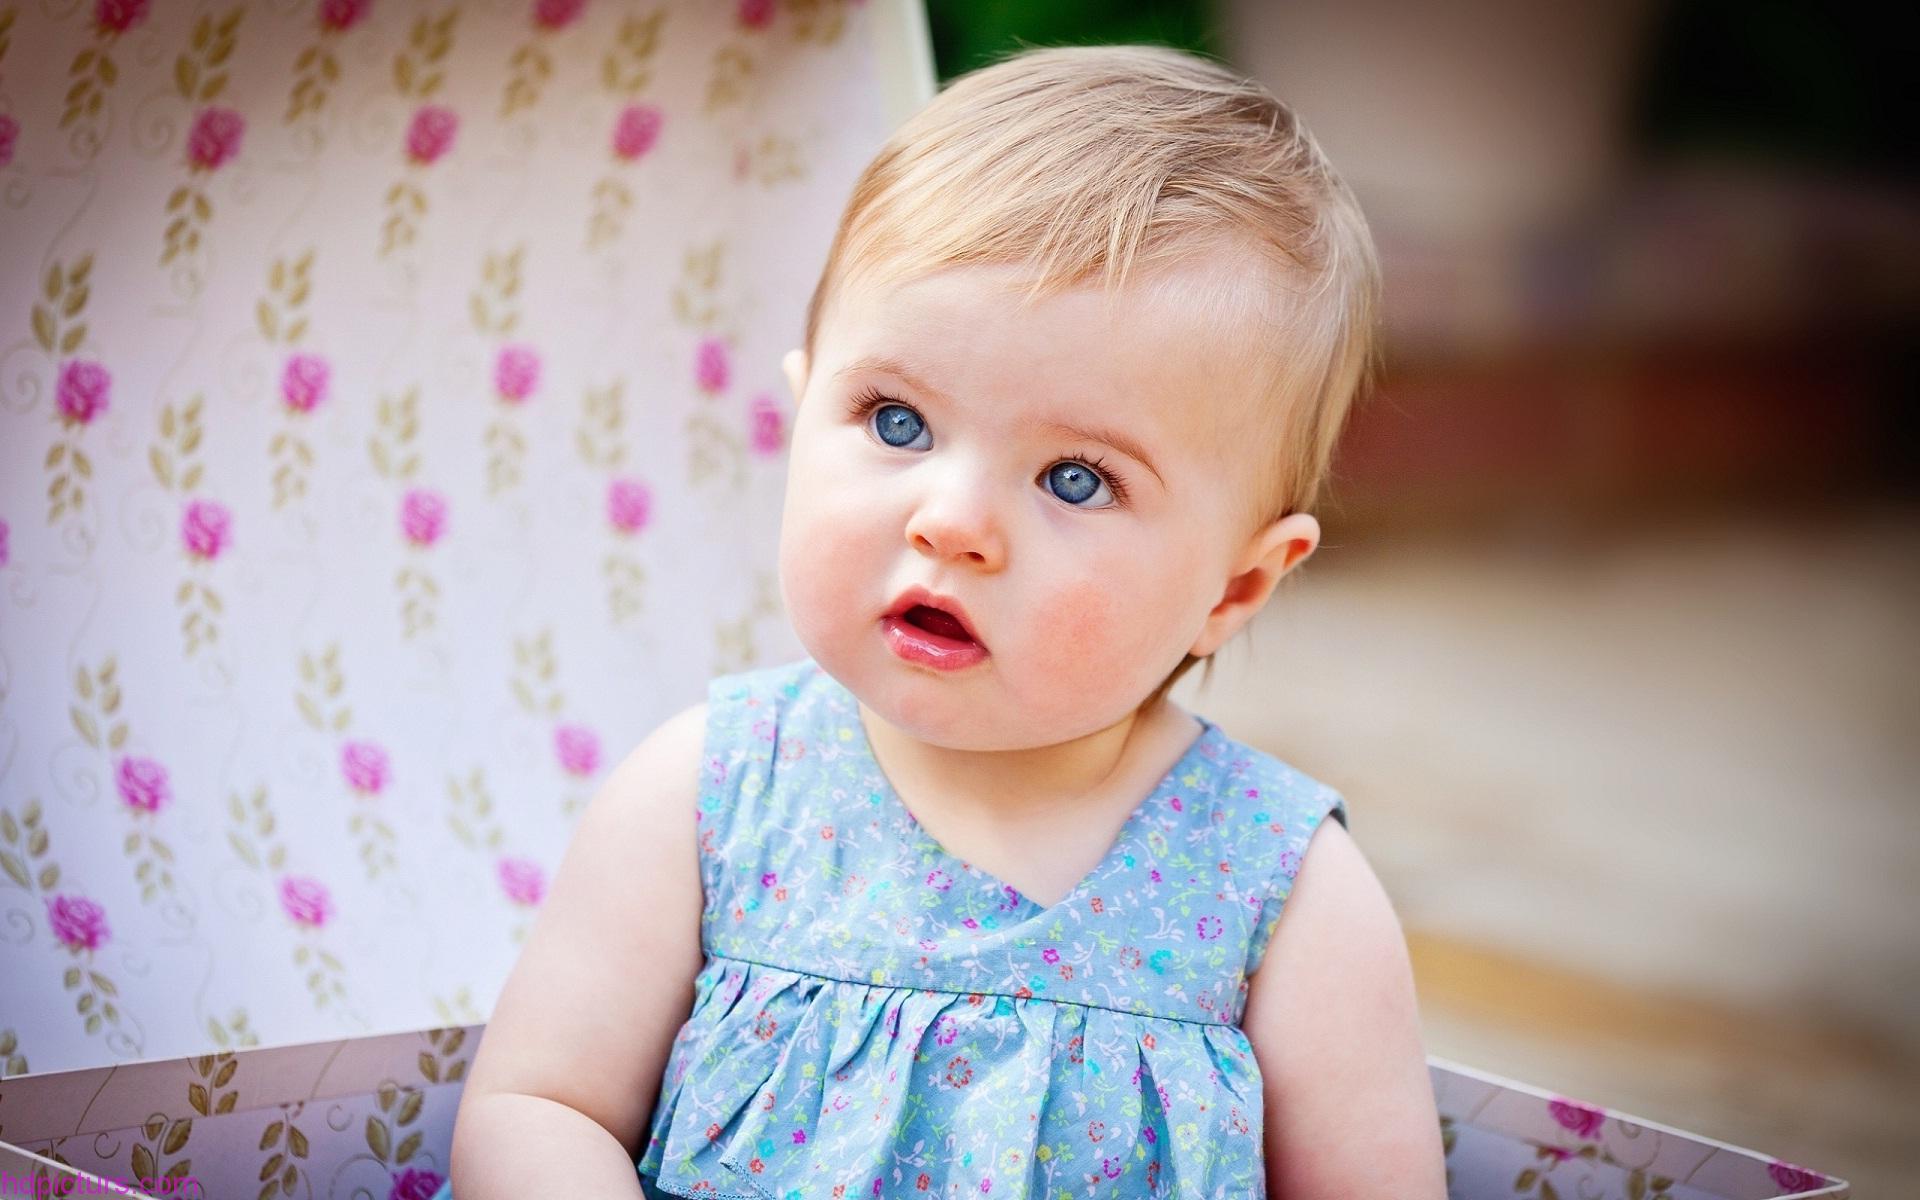 صور اطفال صور بيبي صور اولاد صور حلوين اطفال حلوينصور اطفال صغار2020 59